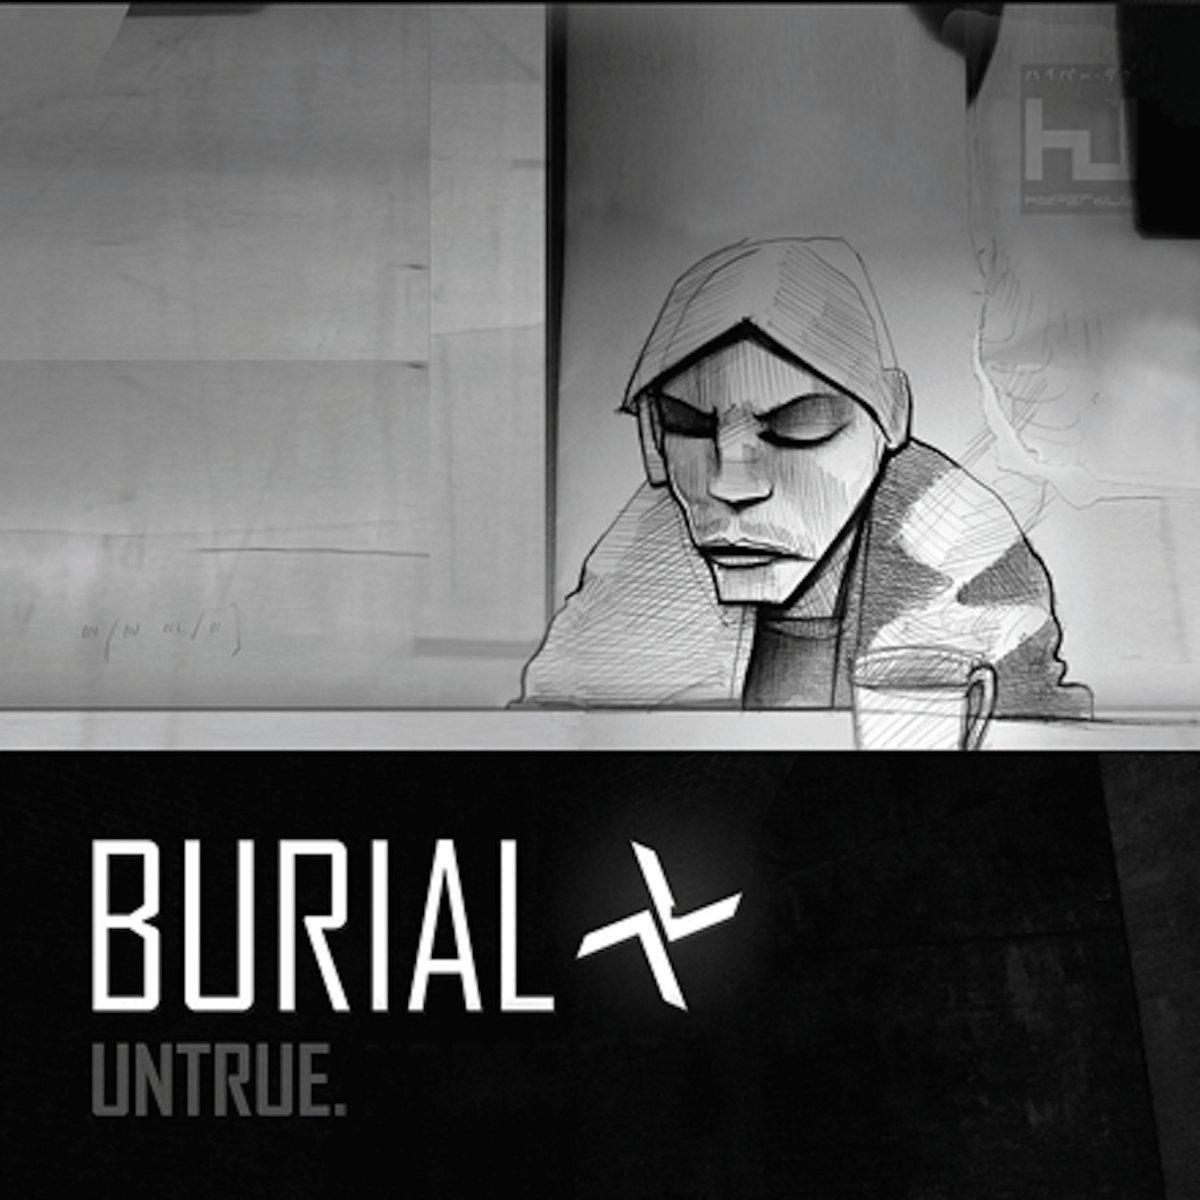 Burial Untrue Hdbcd002d Burial